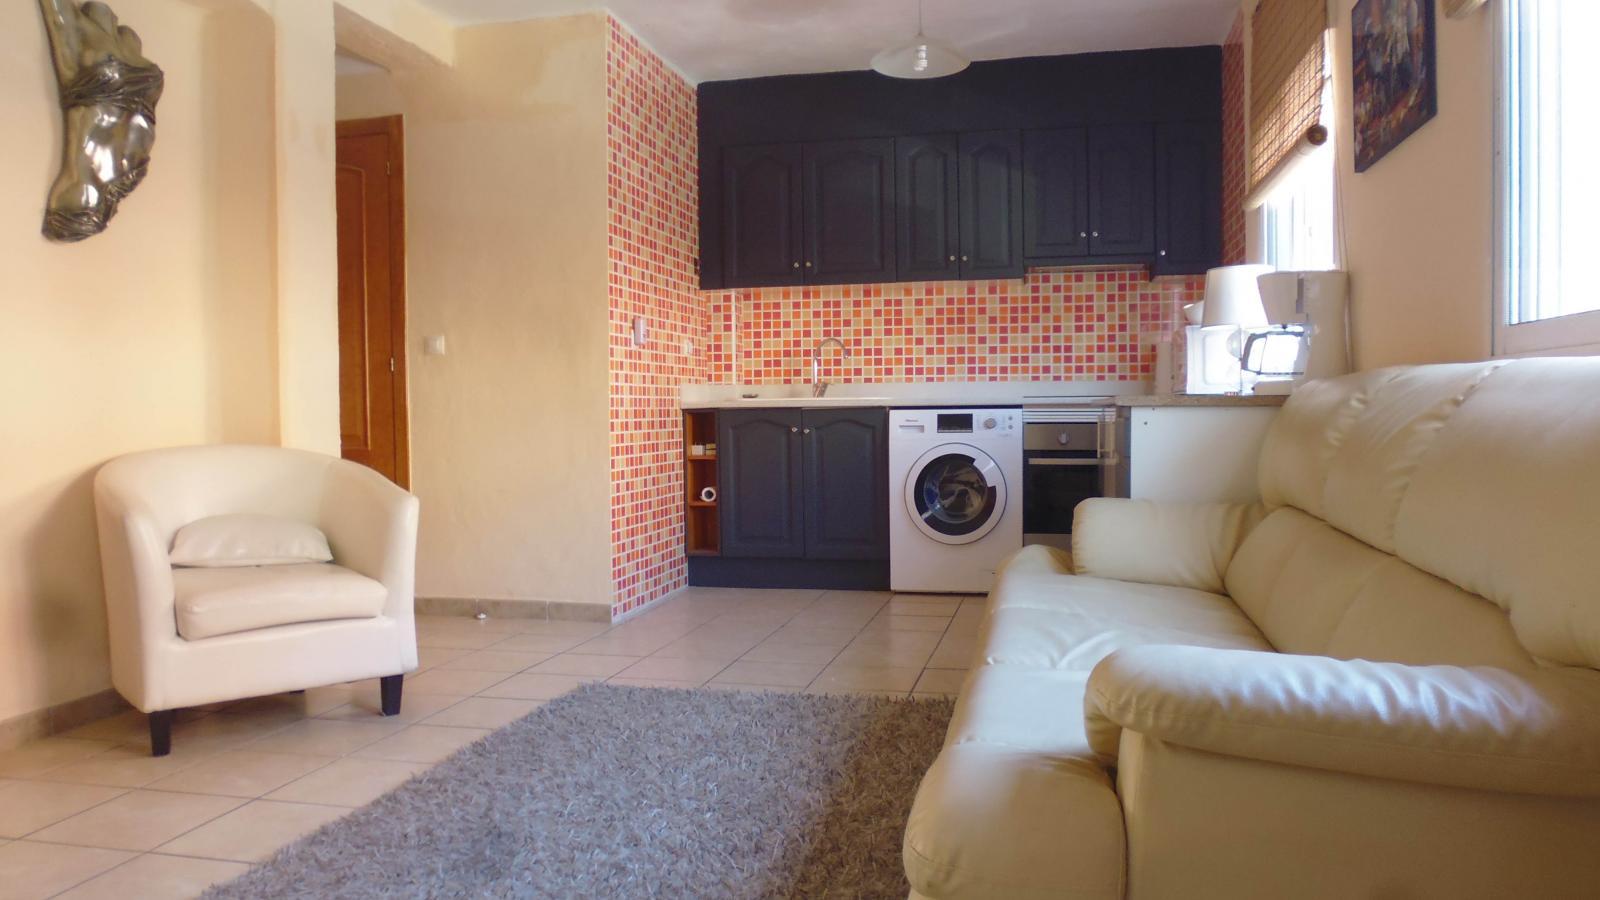 1208520 1780812 foto50378489 - Homes for sale in Alicante under €150,000!